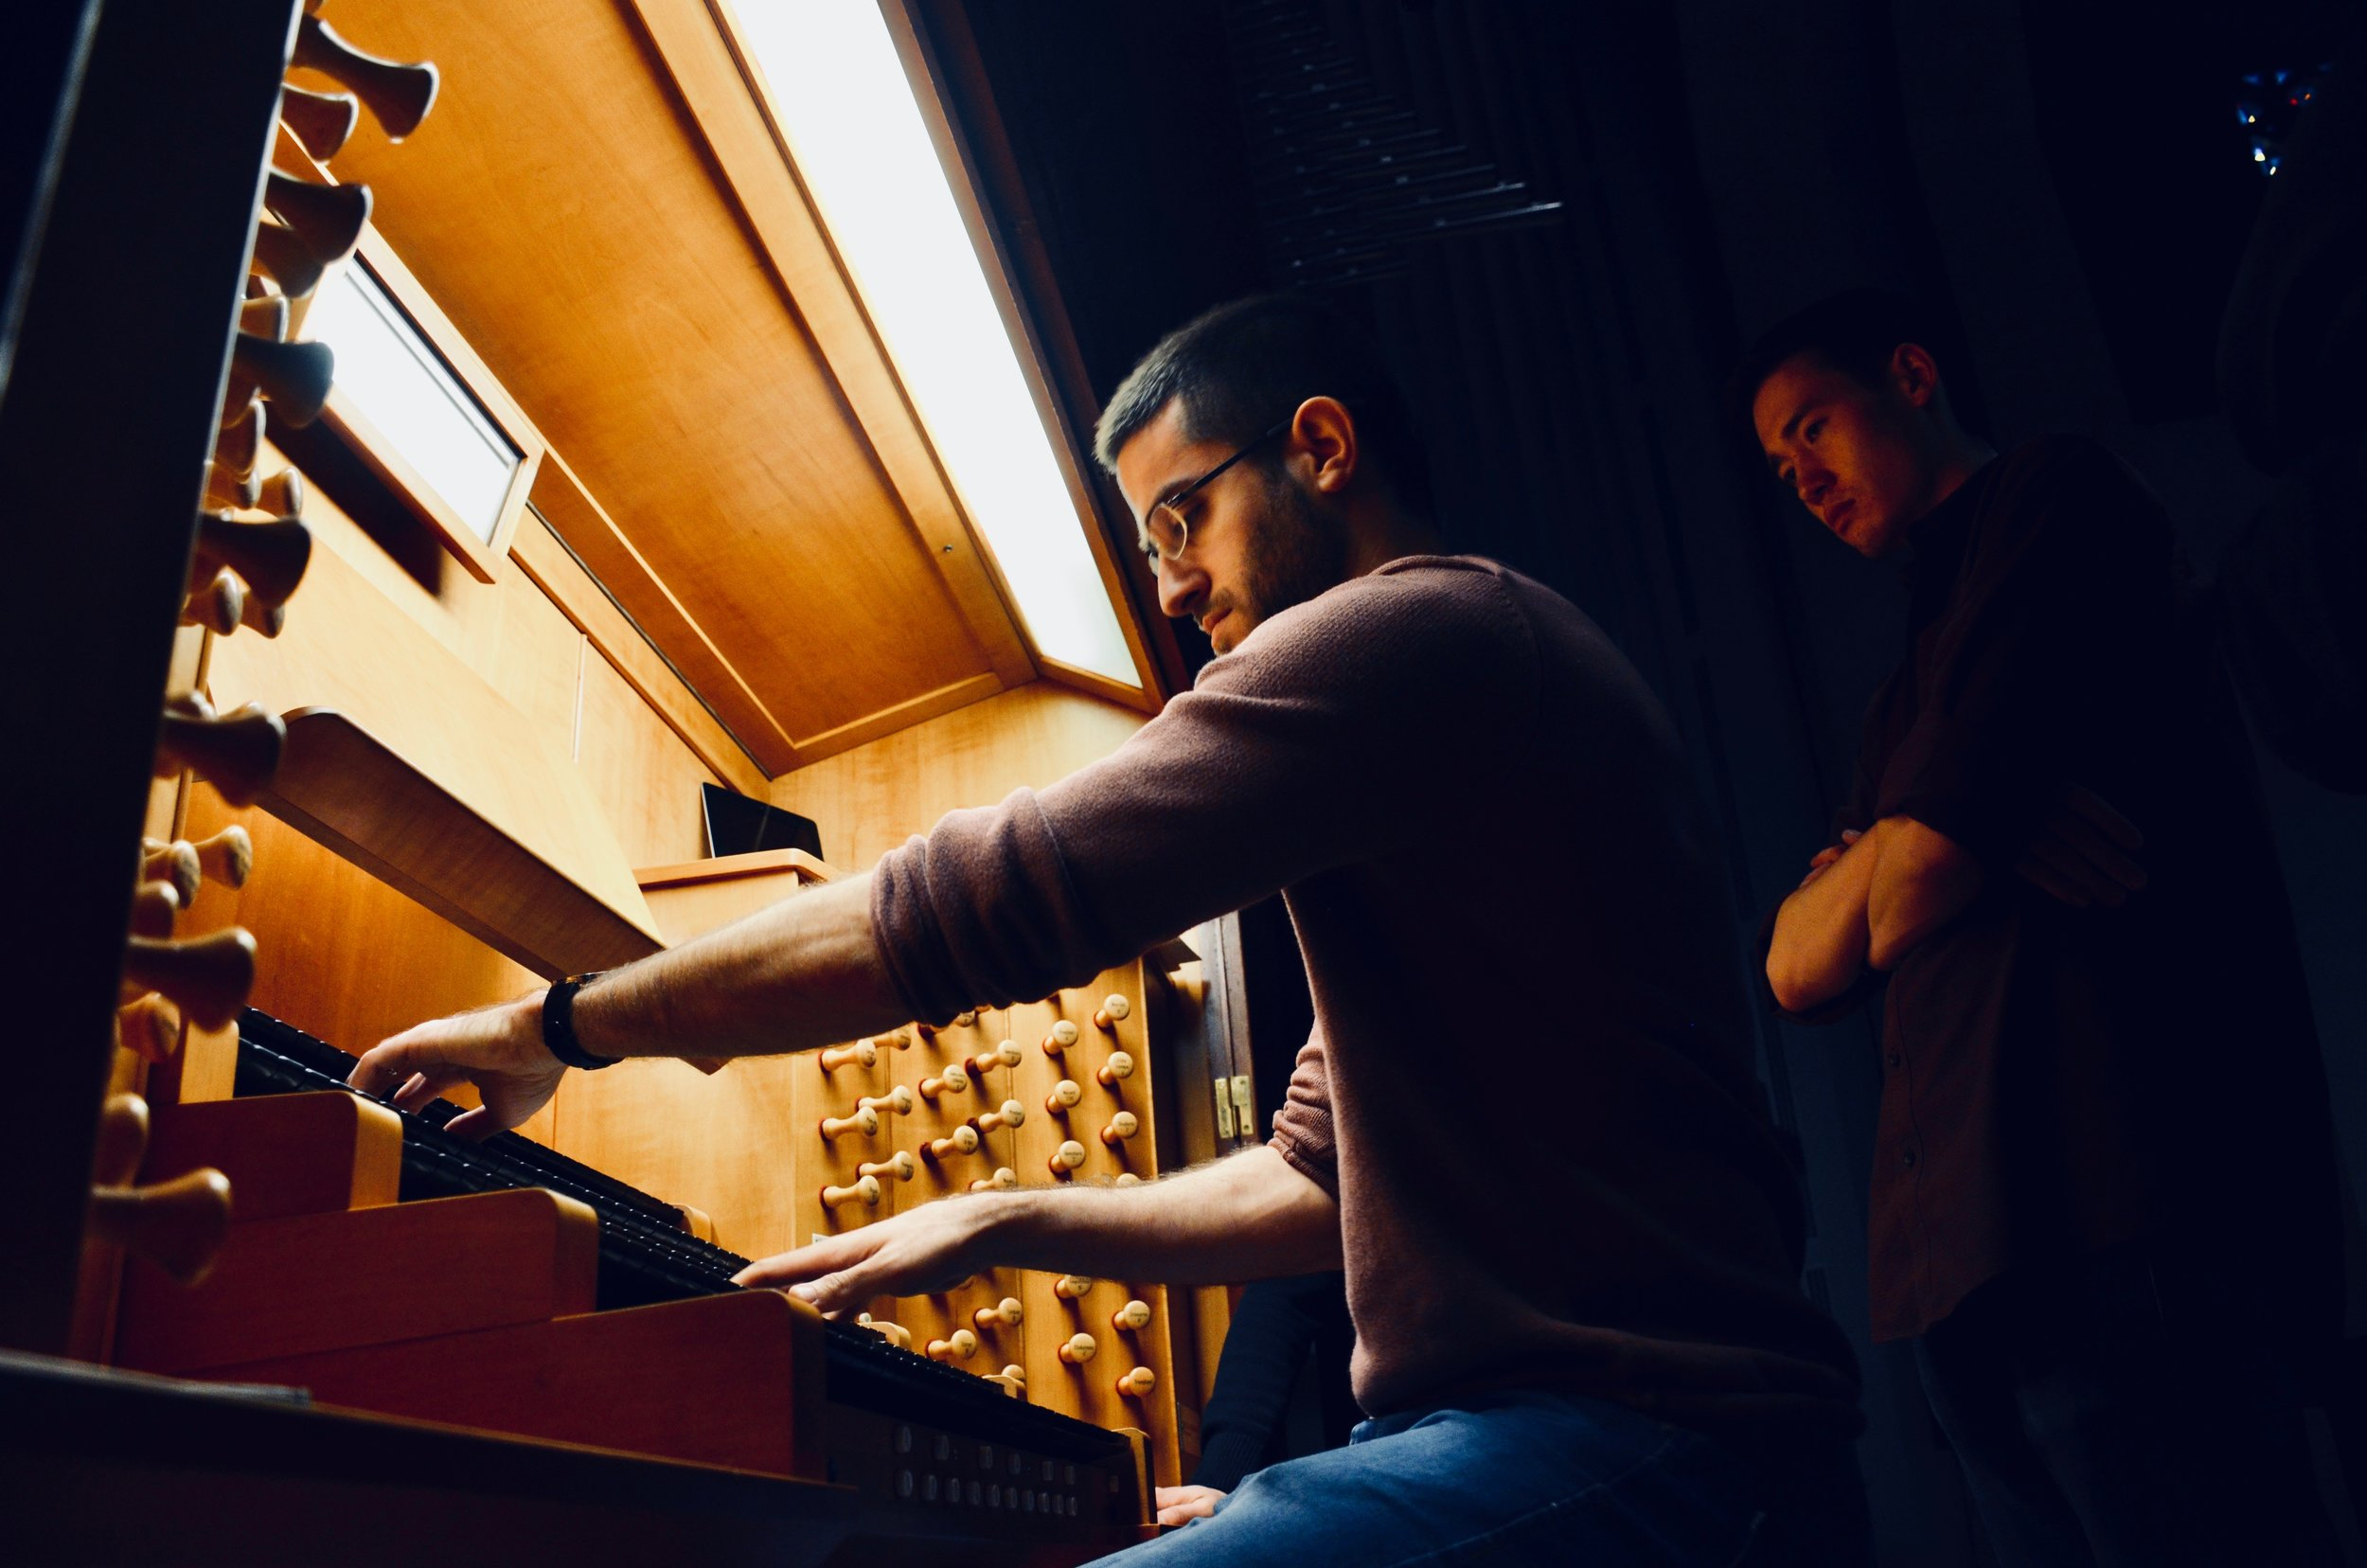 Dor Amram plays the Beckerath organ, St. Joseph Oratory, Montreal